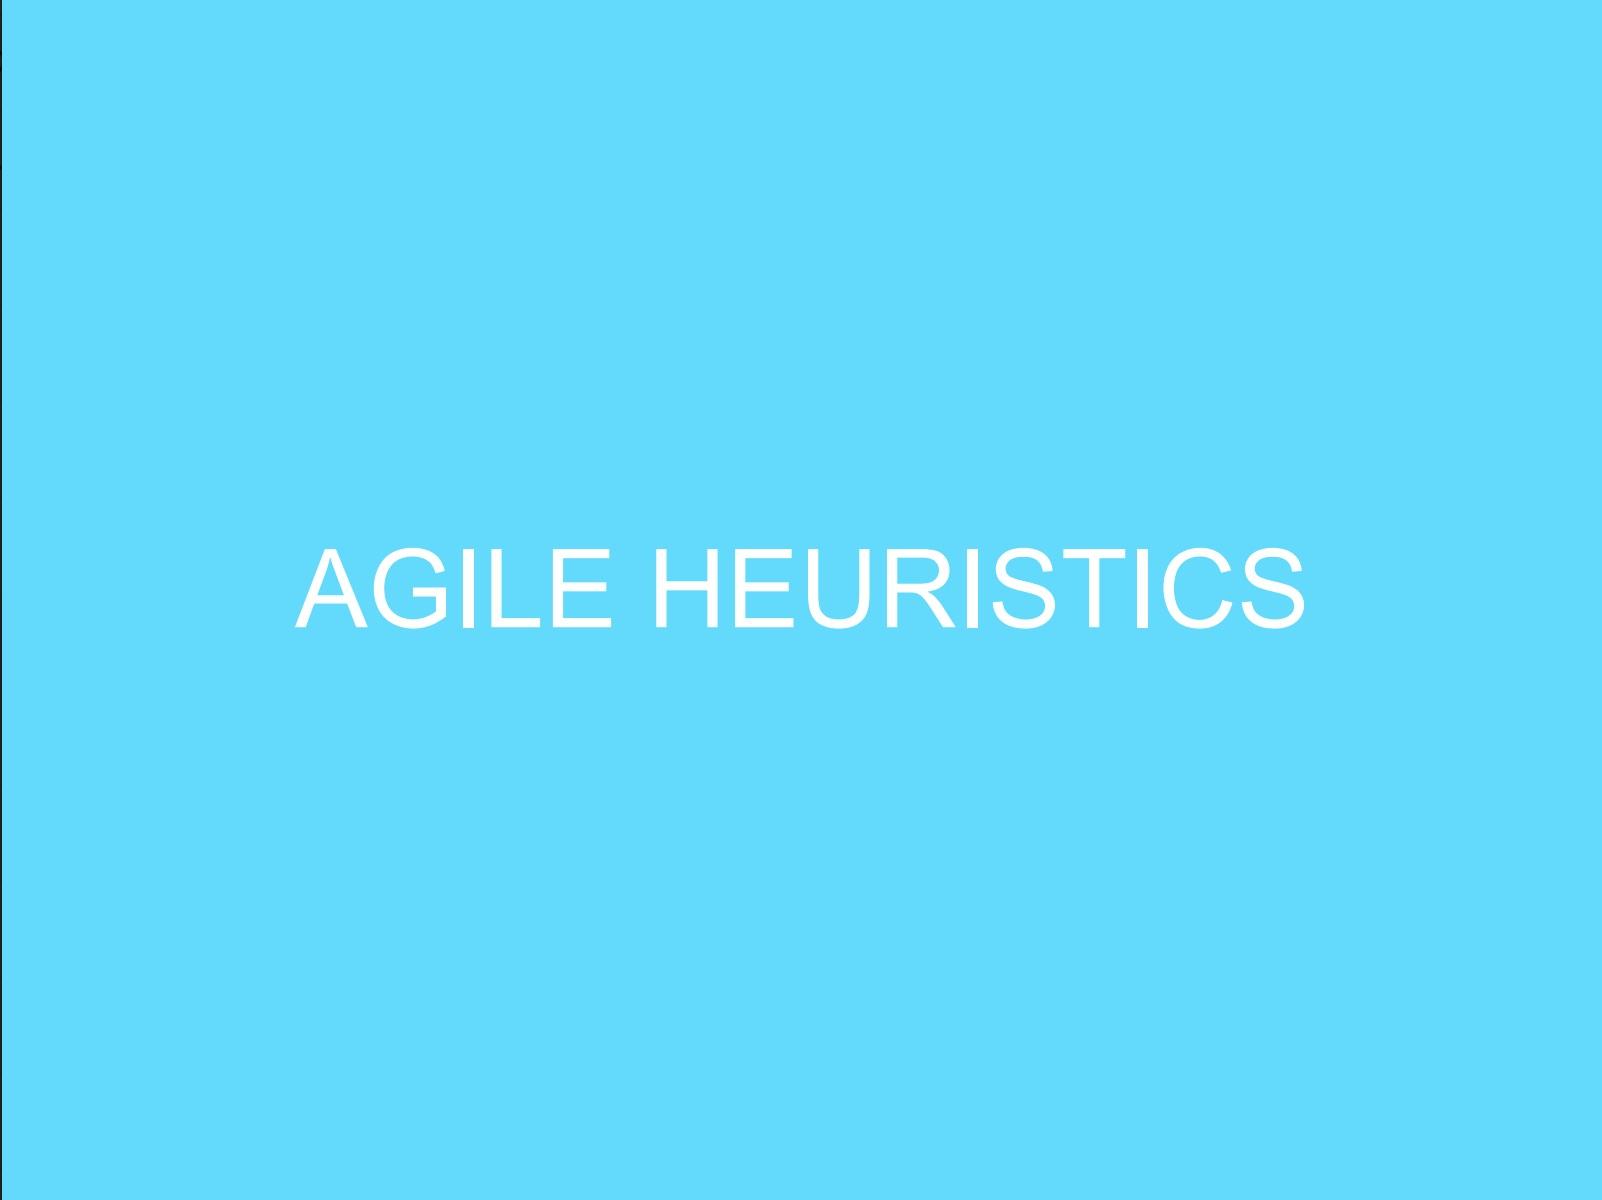 Agile Heuristics - Presentation